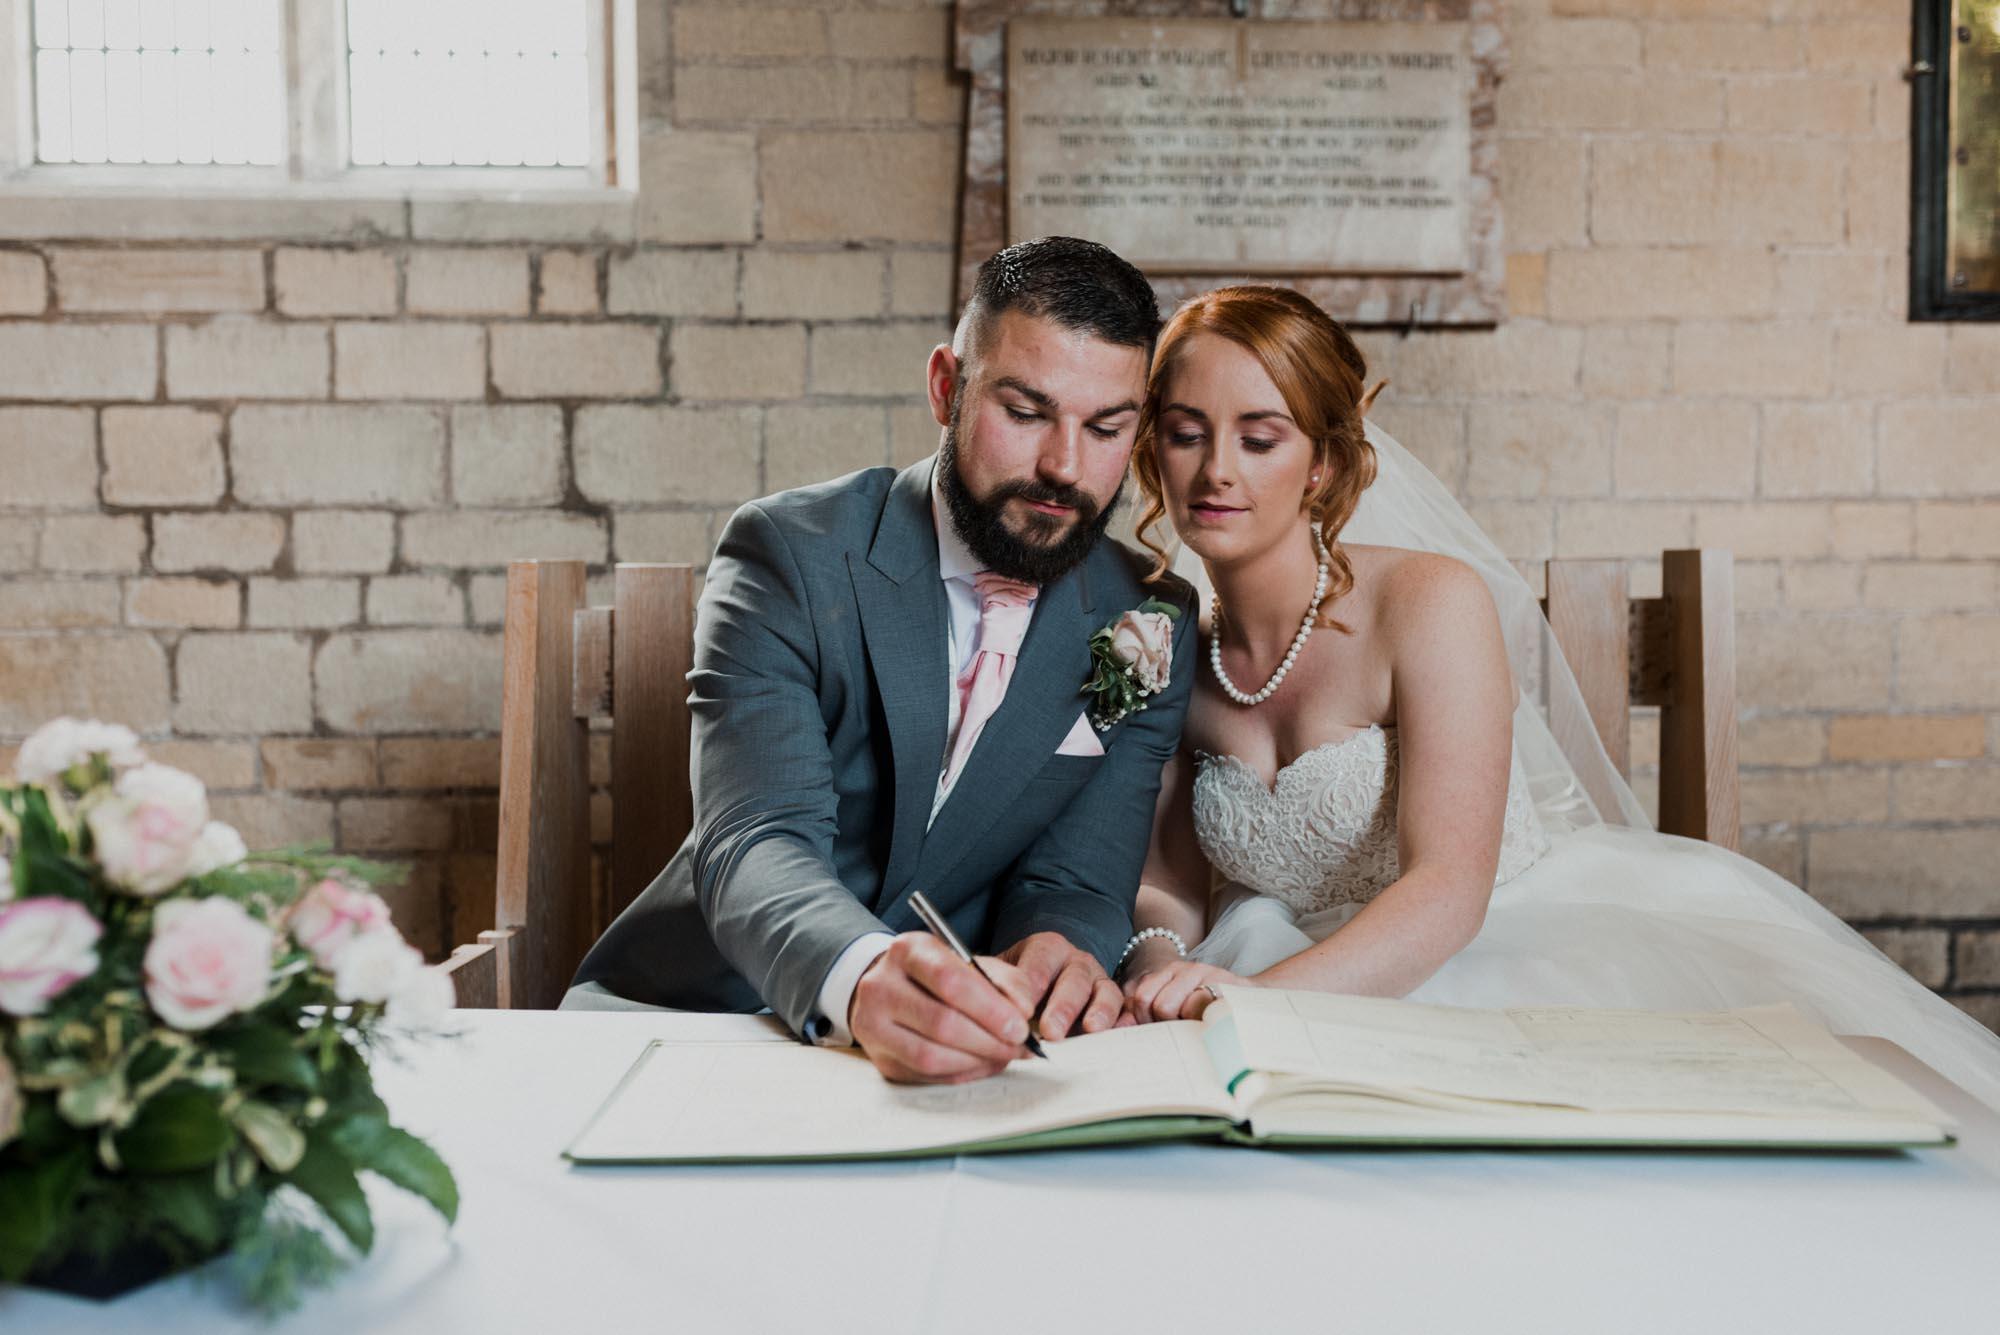 dinnington wedding photographer